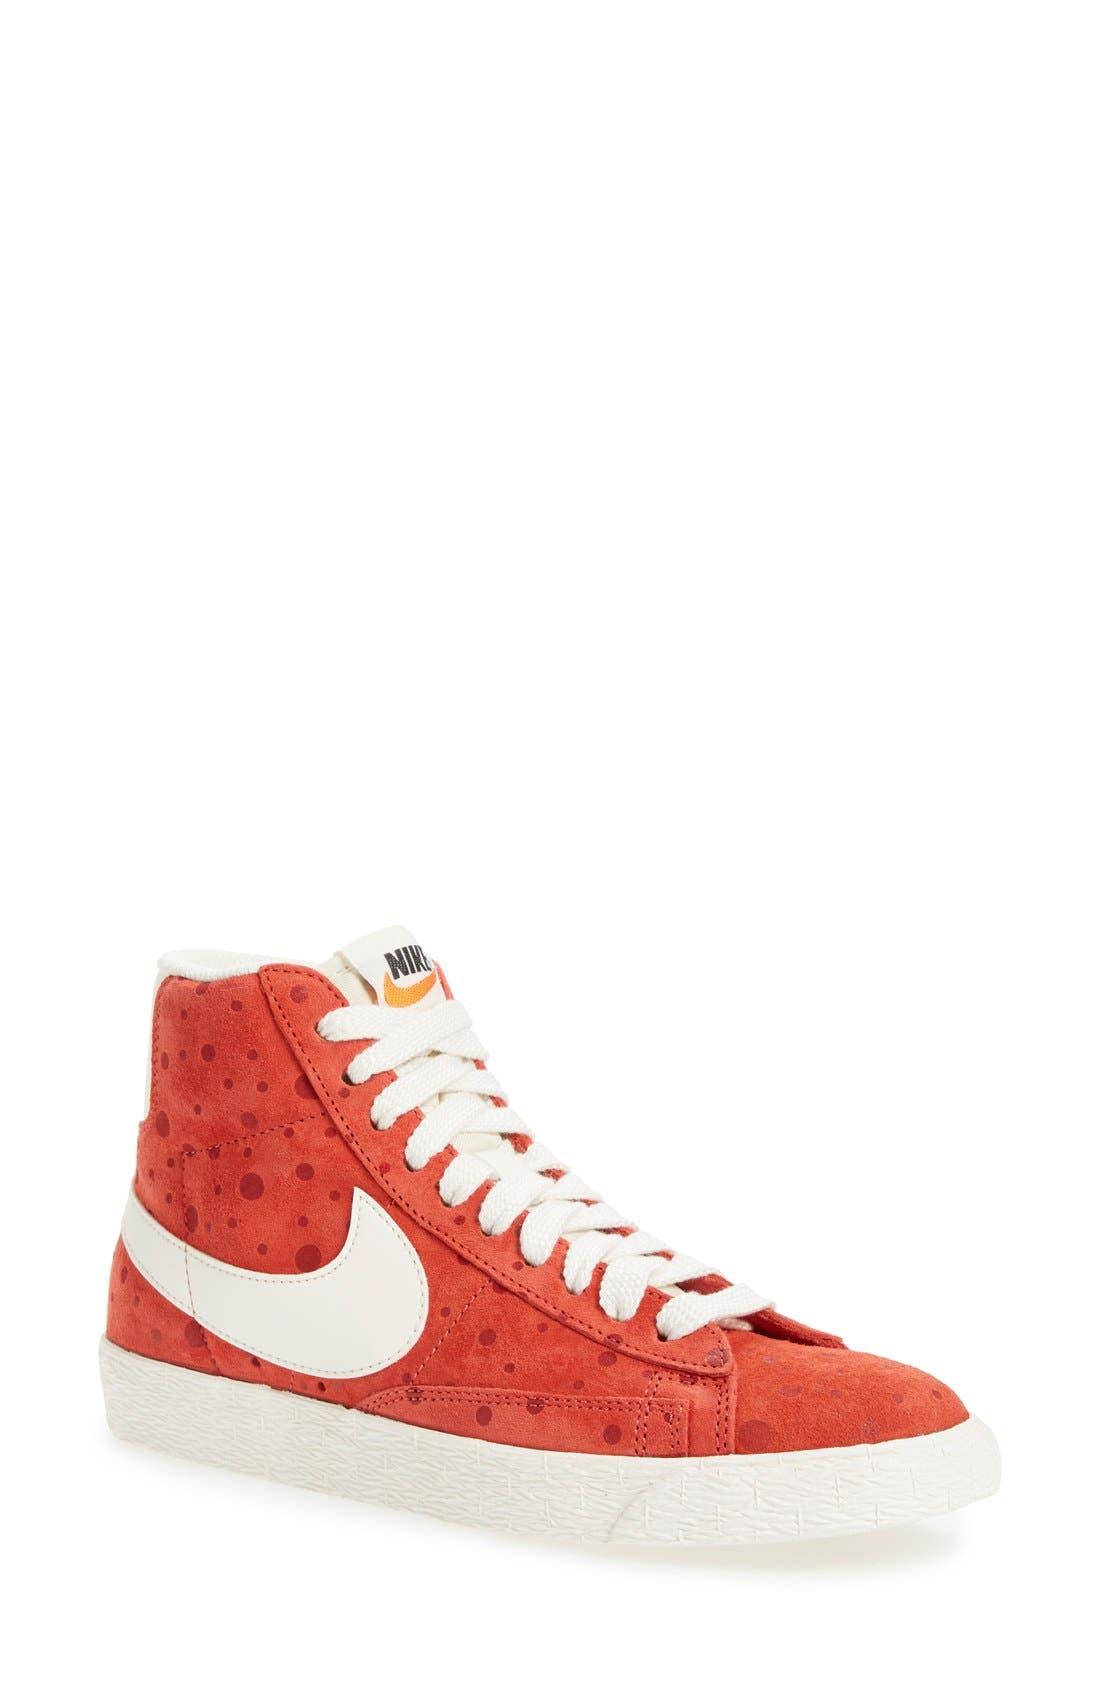 Alternate Image 1 Selected - Nike 'Blazer' Vintage High Top Basketball Sneaker (Women)